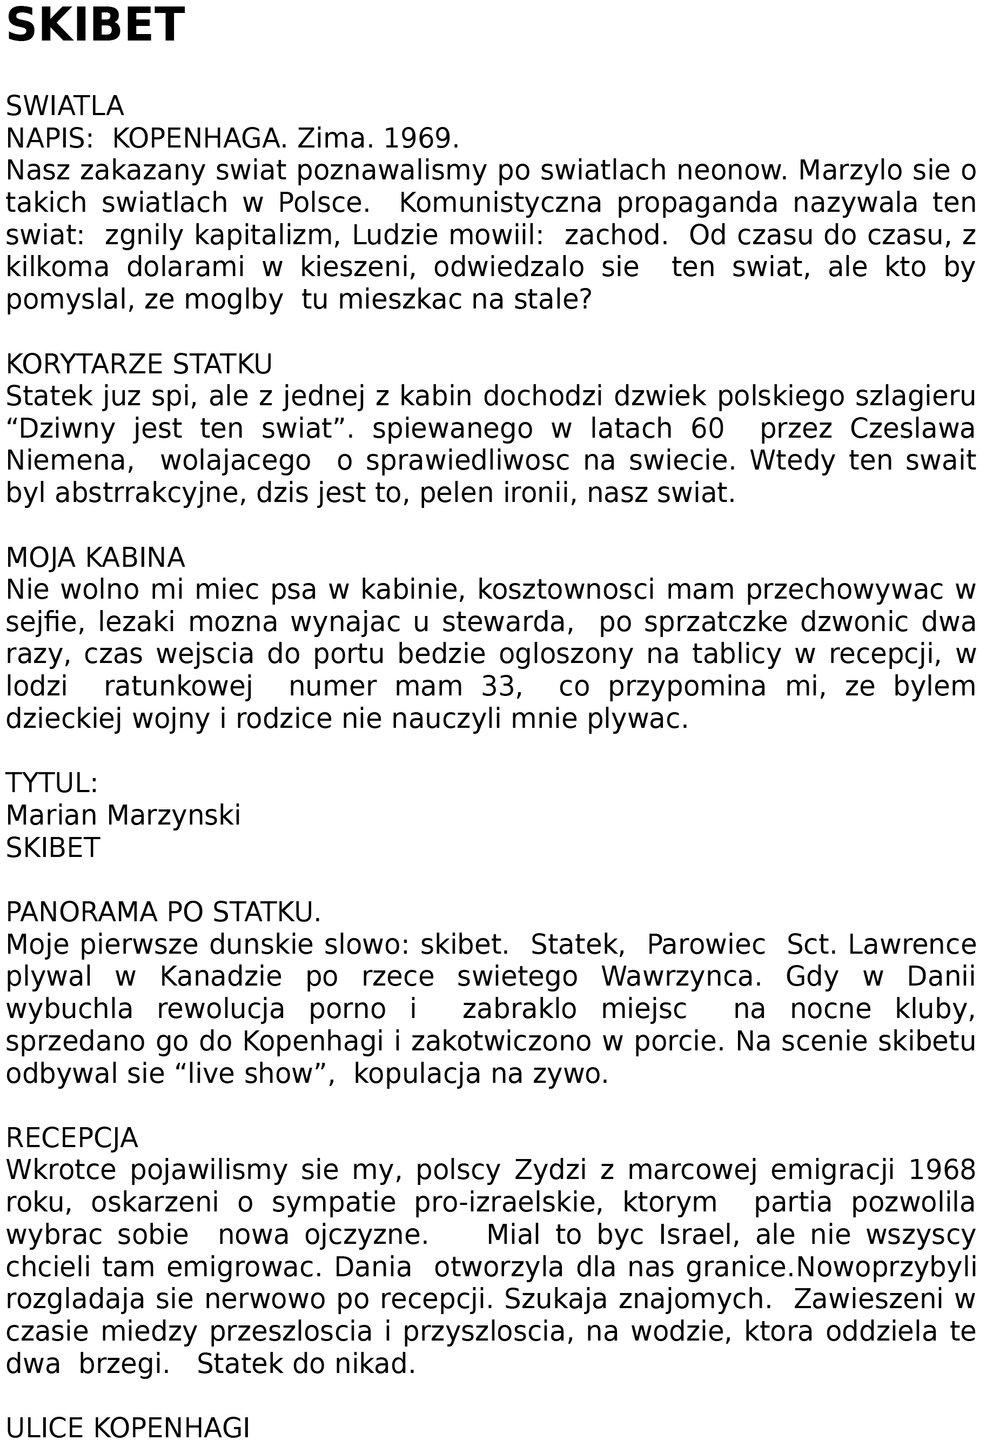 SKIBET-WERSJA-POLSKA-1.jpg